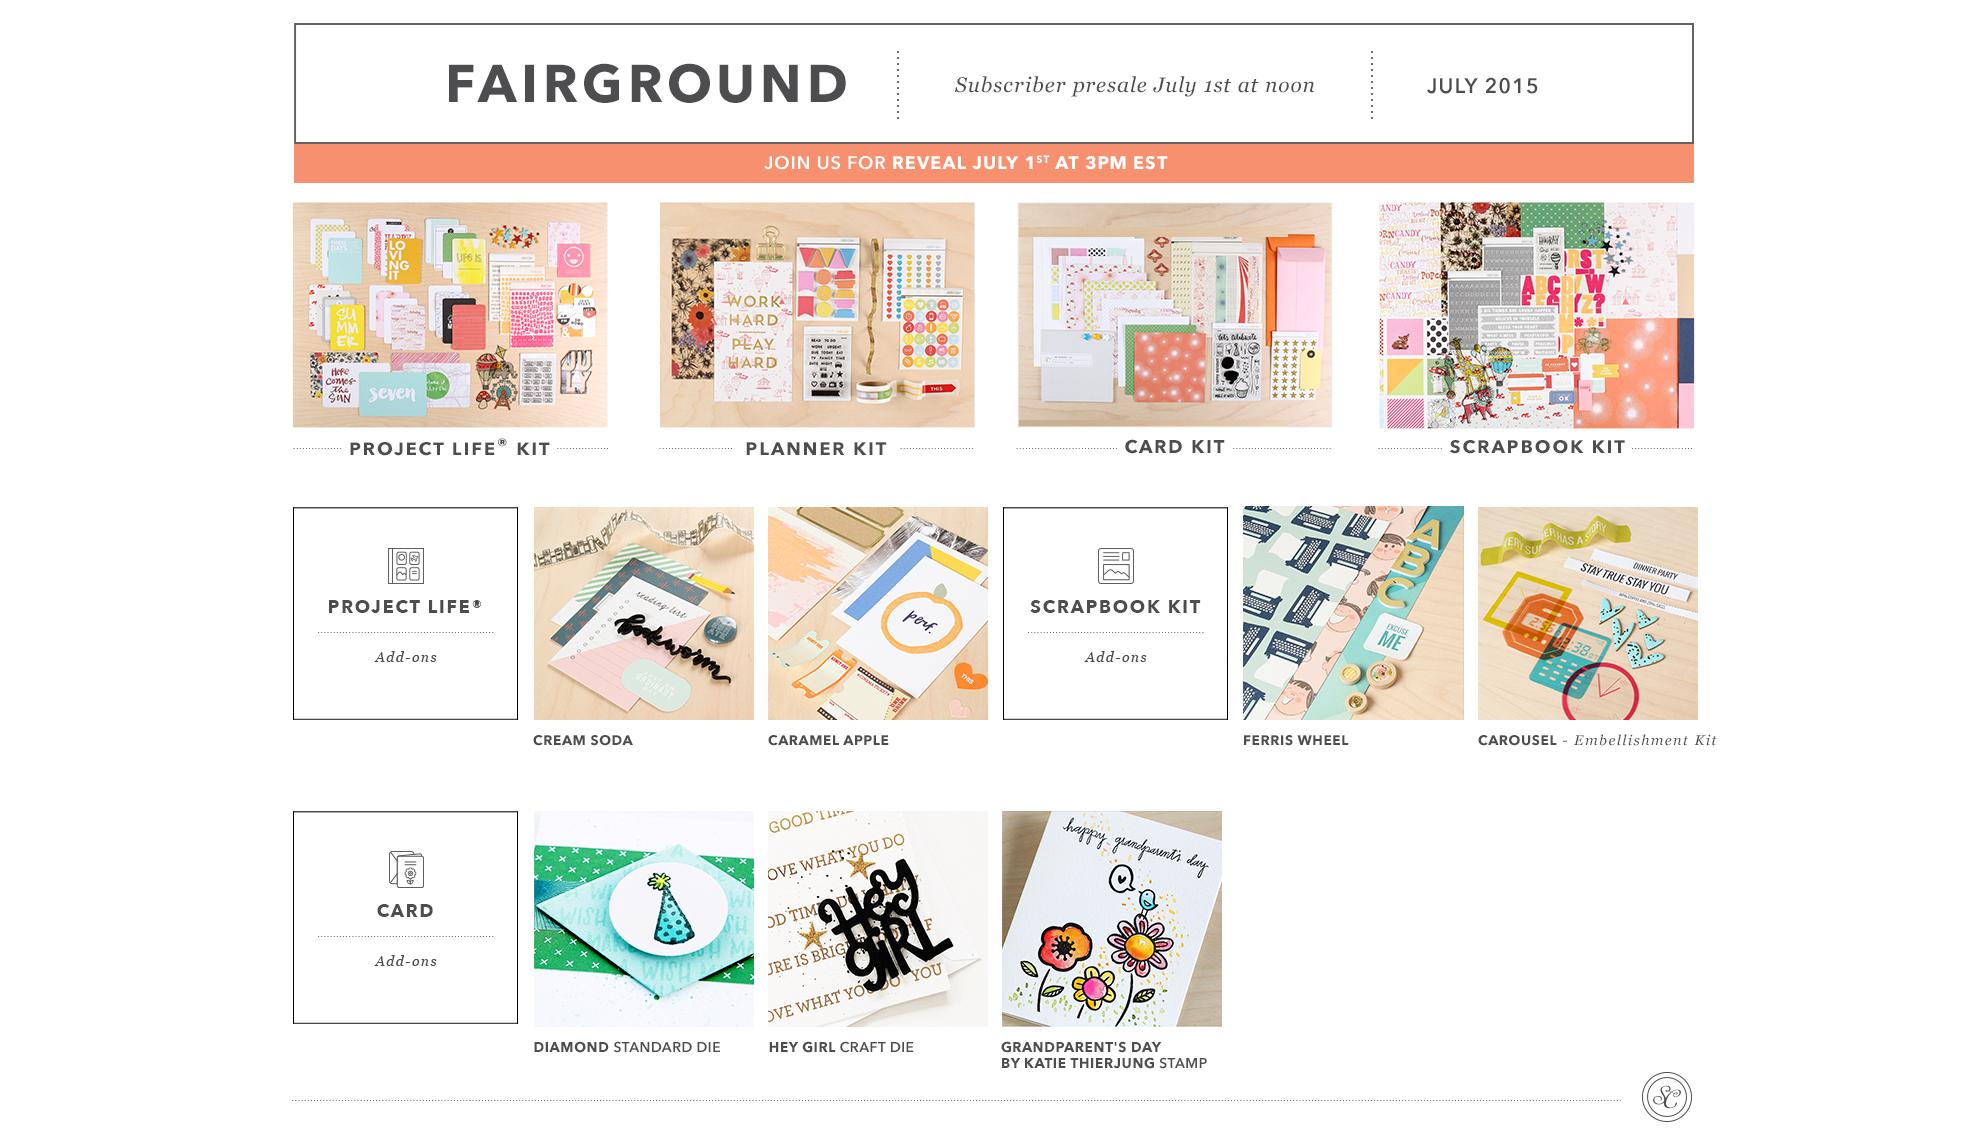 Fairground Reveal